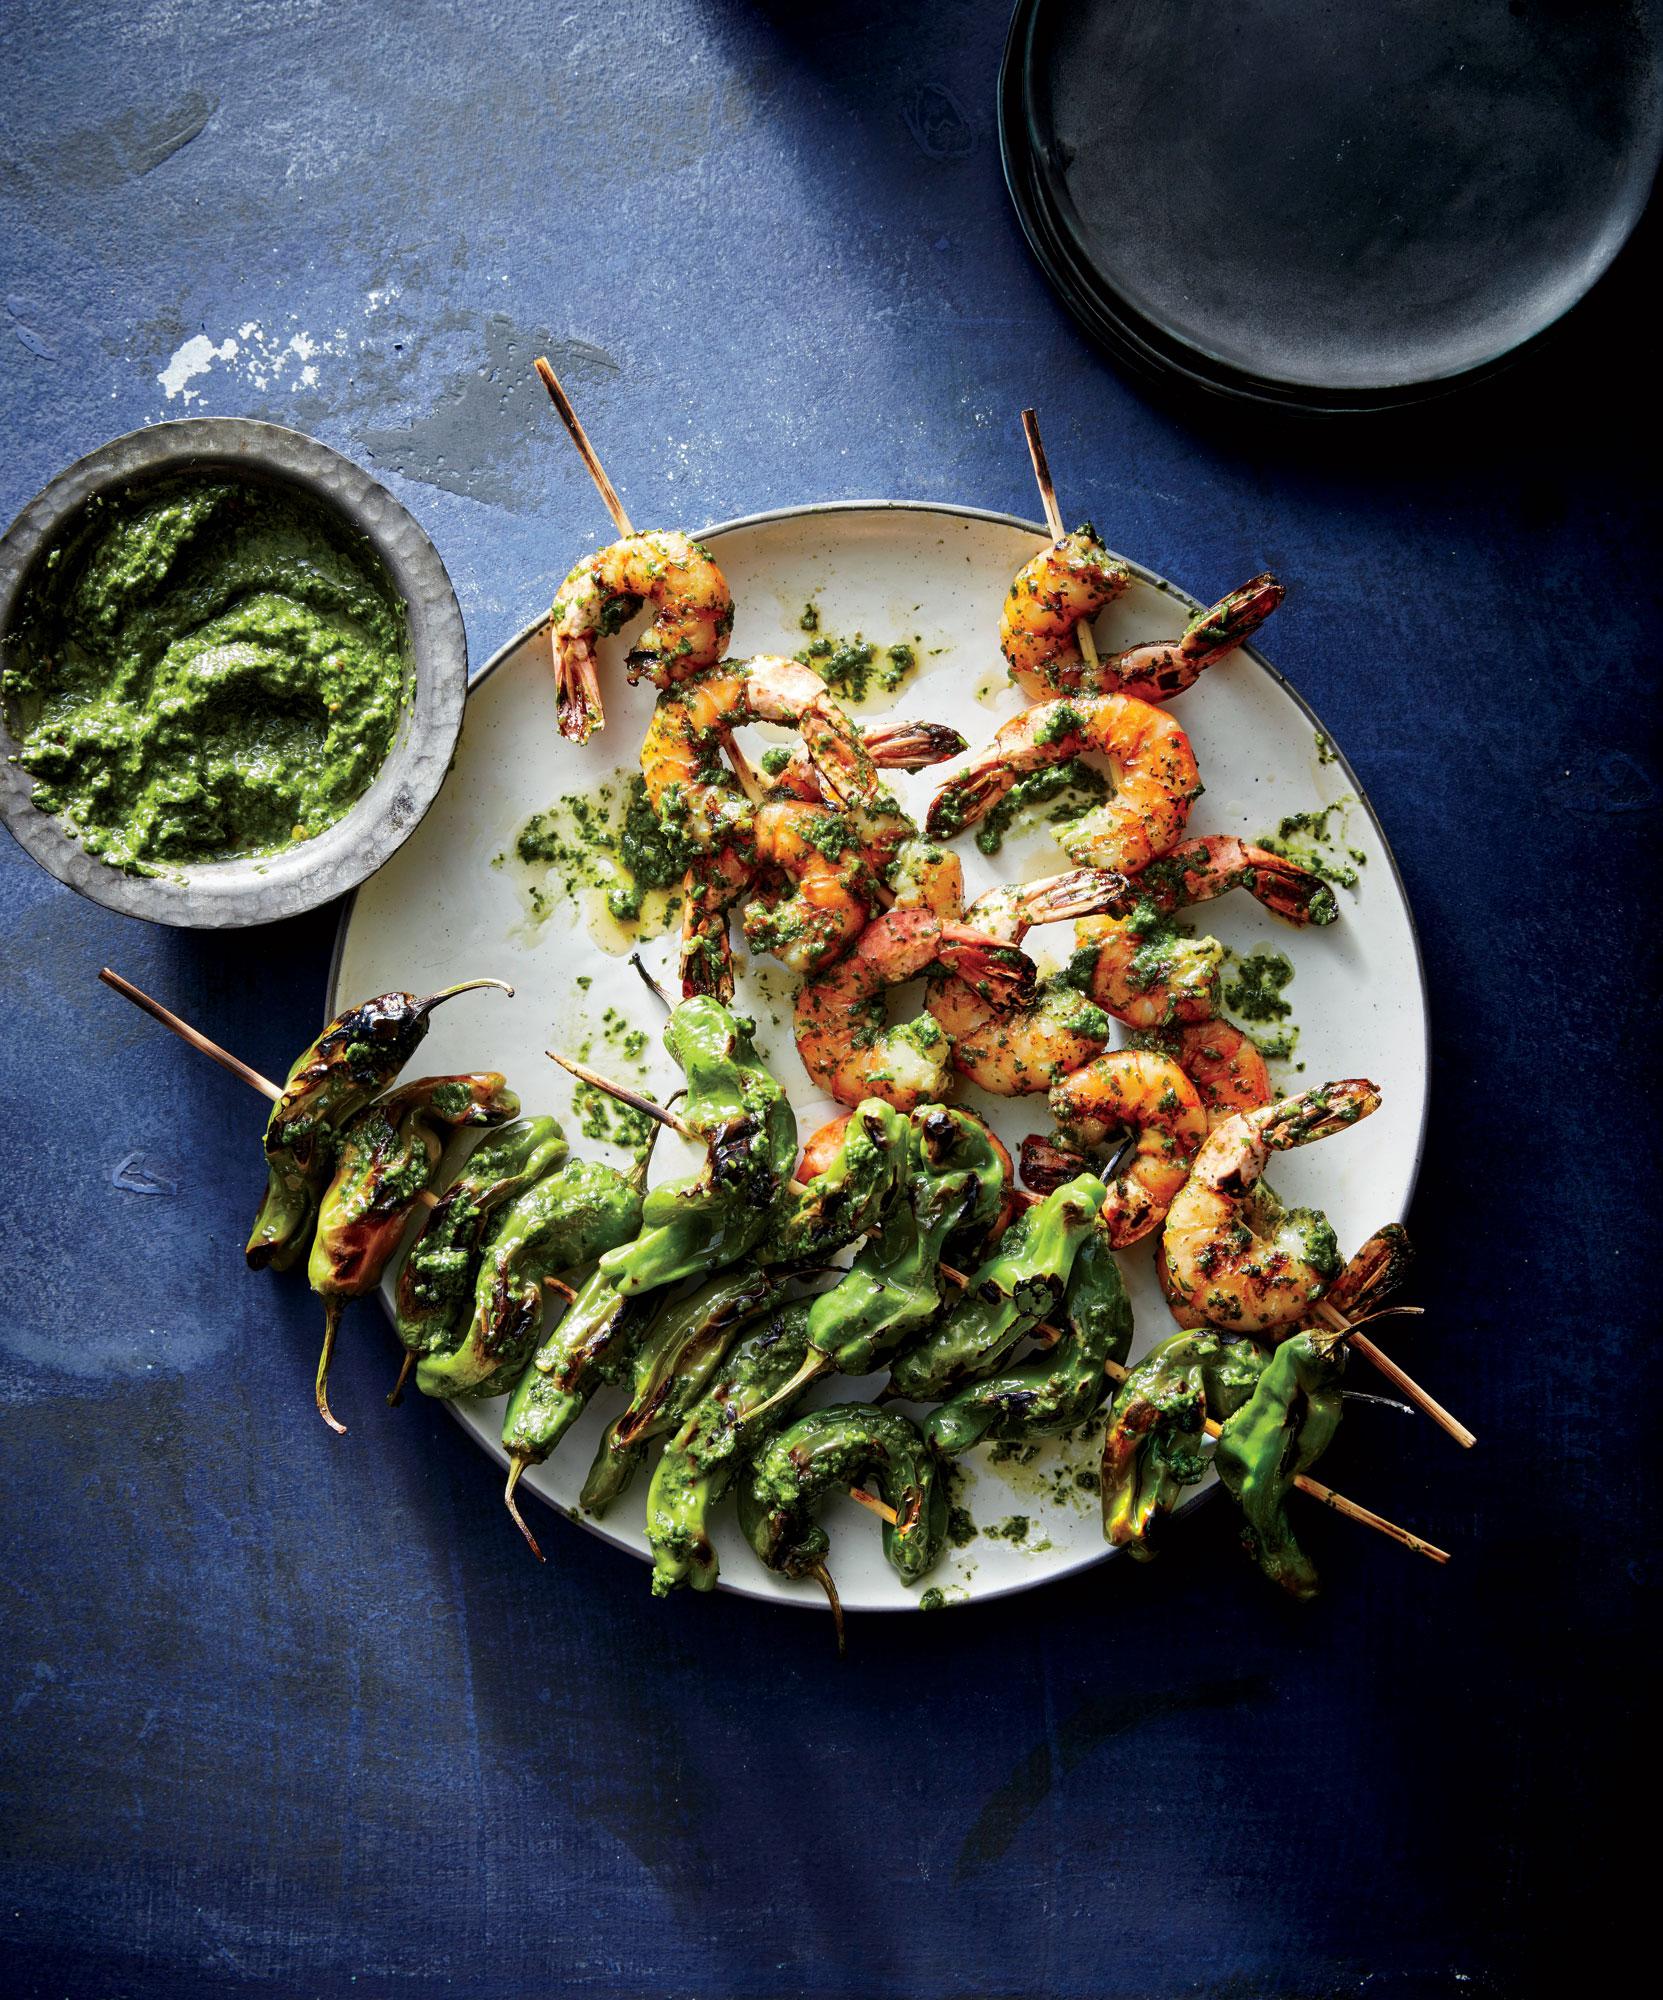 Shishito and Shrimp Skewers with Chimichurri